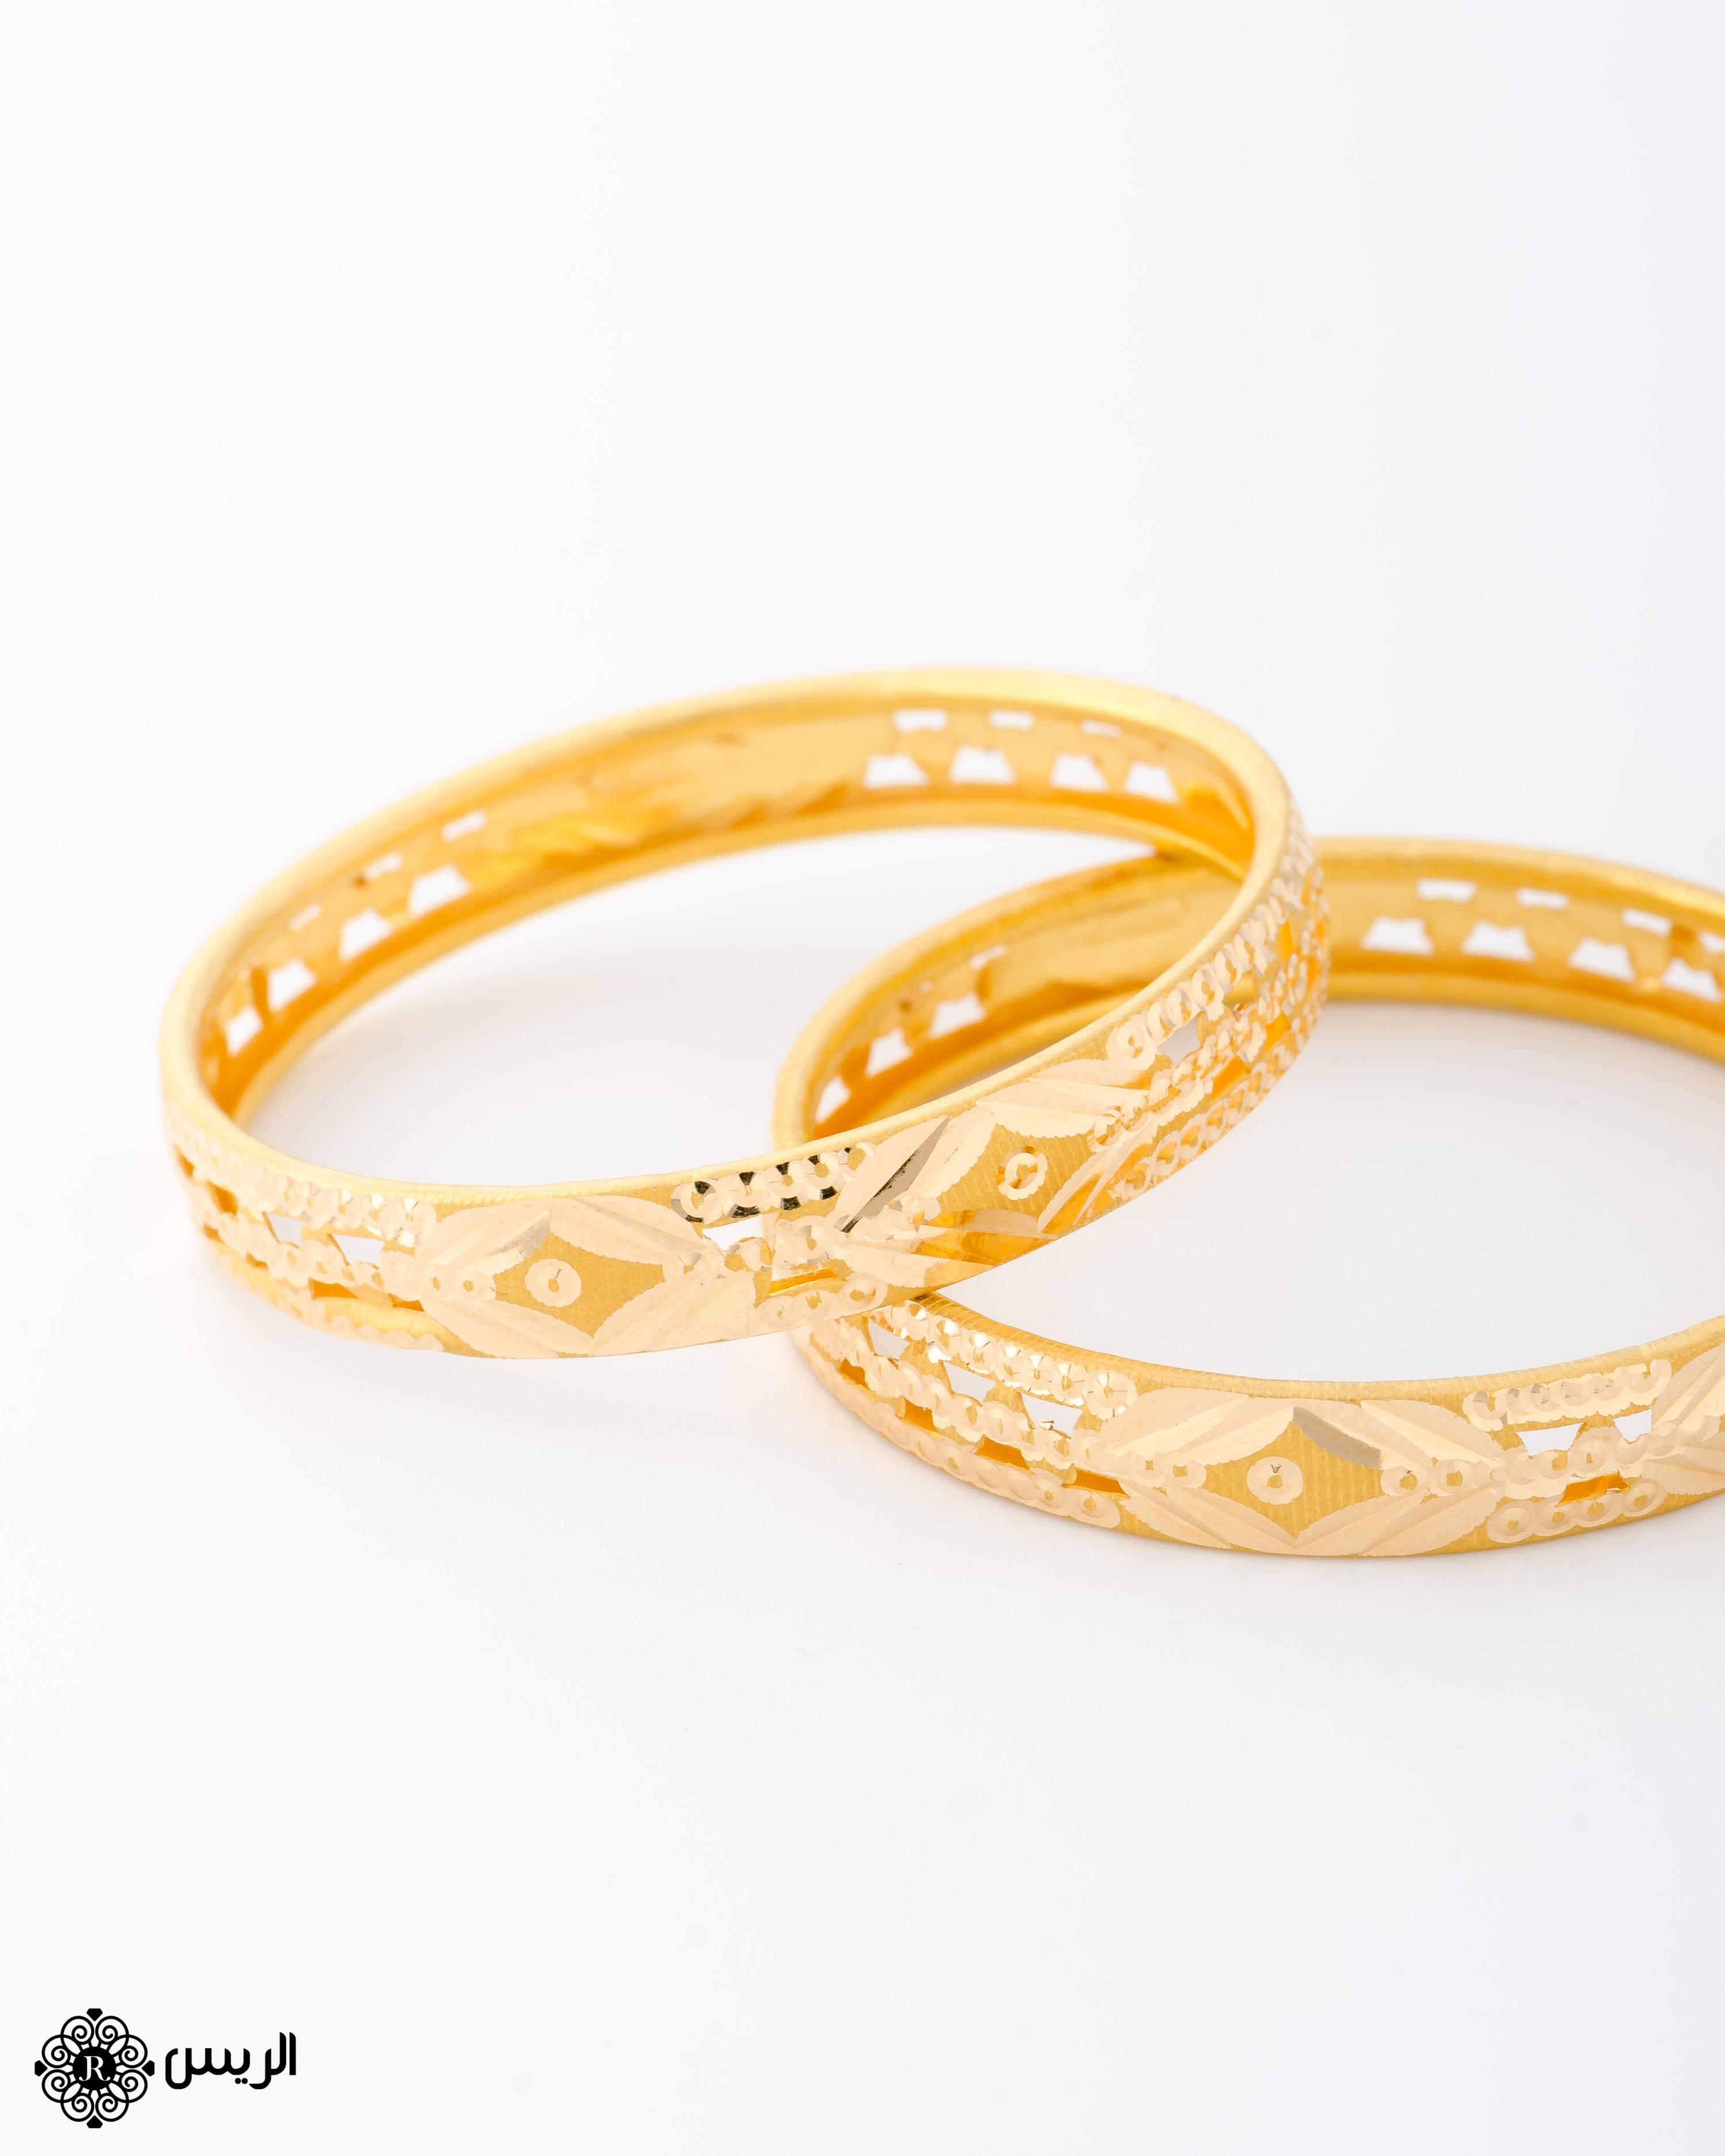 Raies jewelry Kids Bangle بنجرة أطفال الريس للمجوهرات